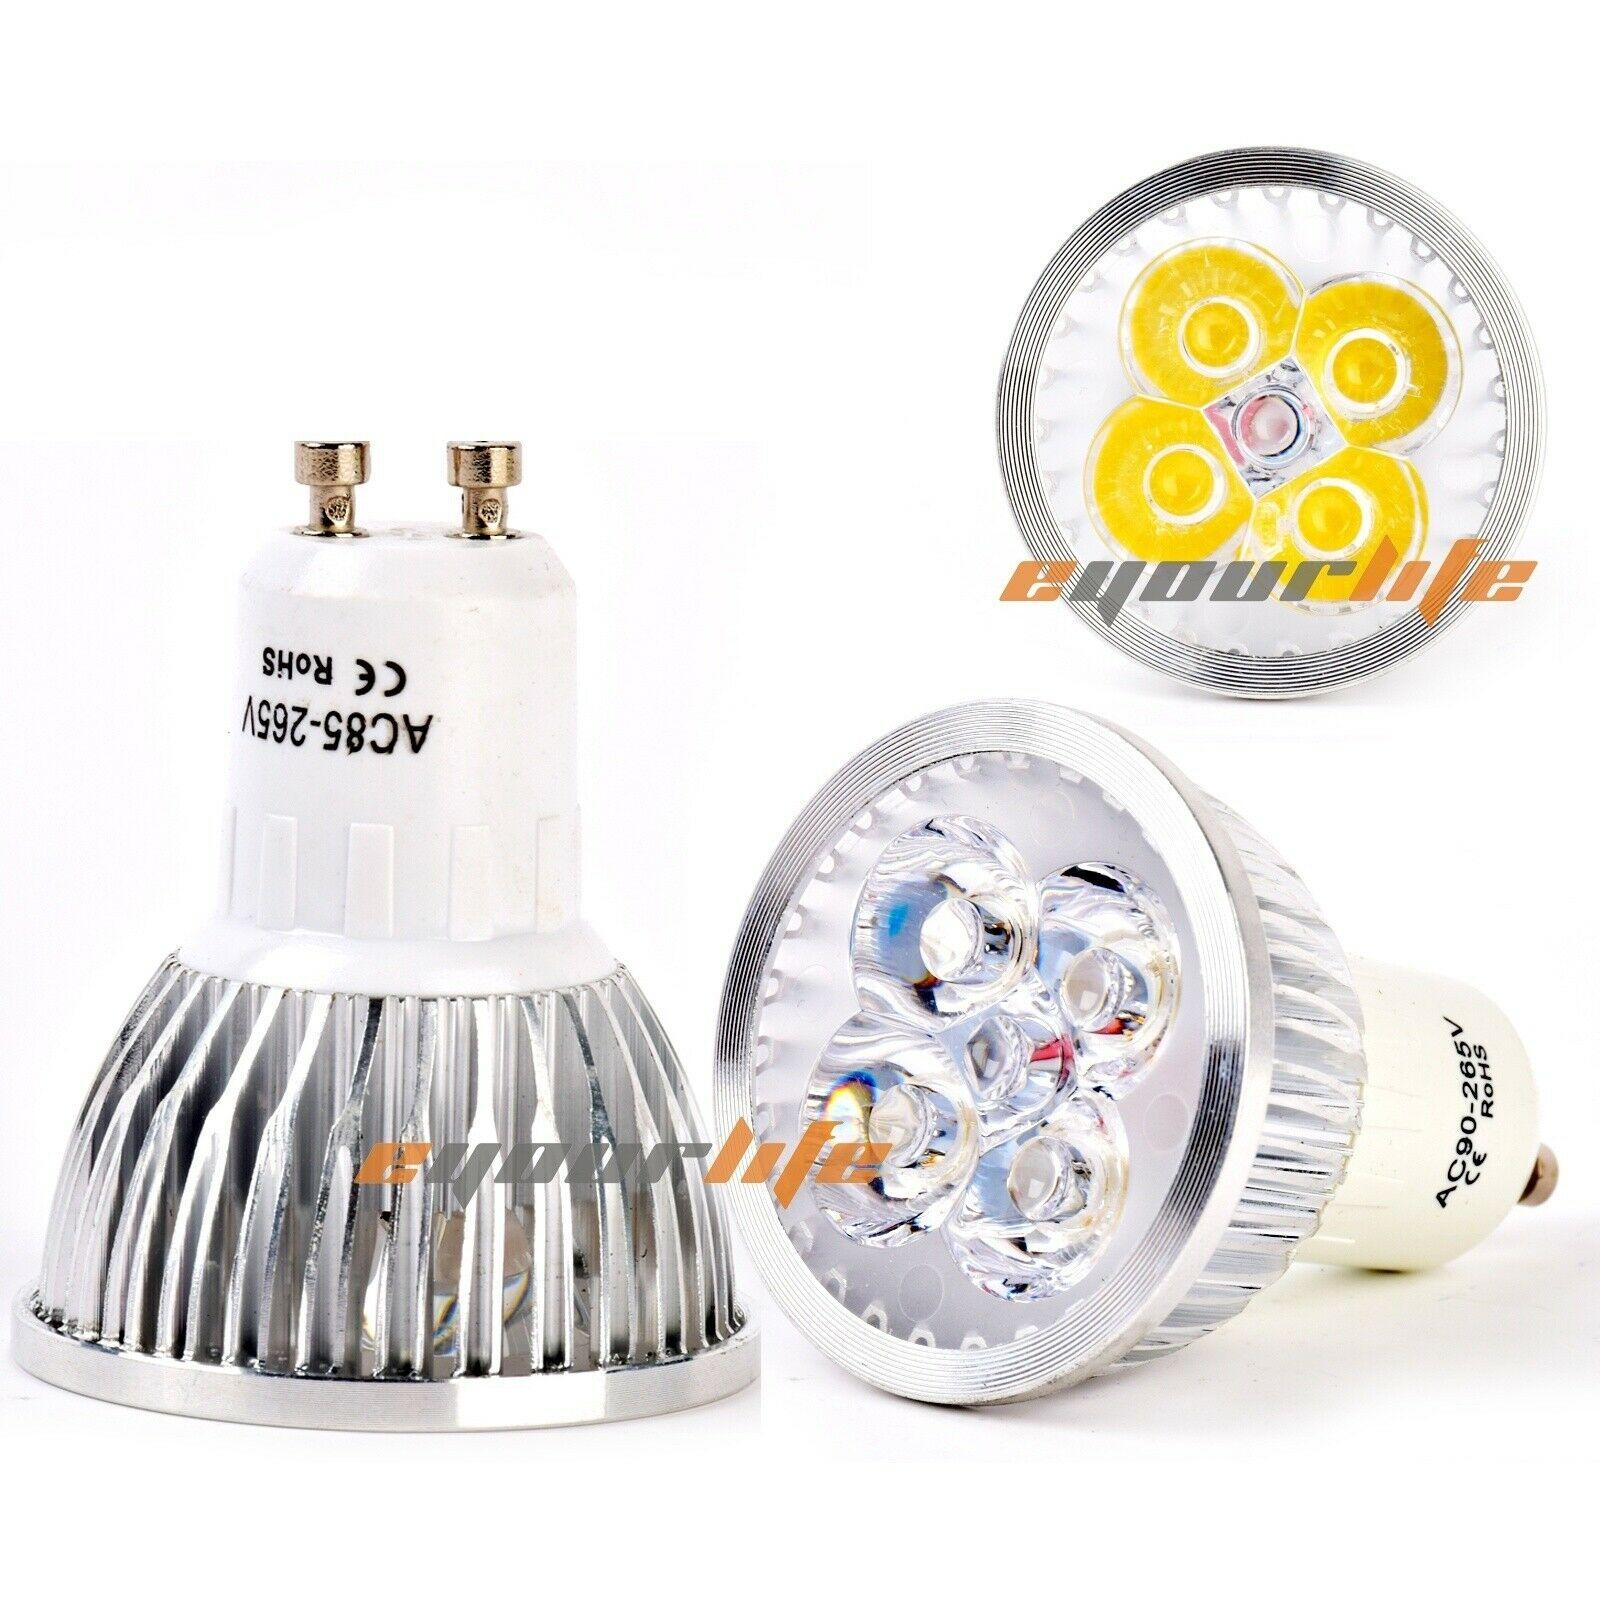 Bombilla blanca cálida Epistar 9W 12W 15W GU10 foco LED con regulable